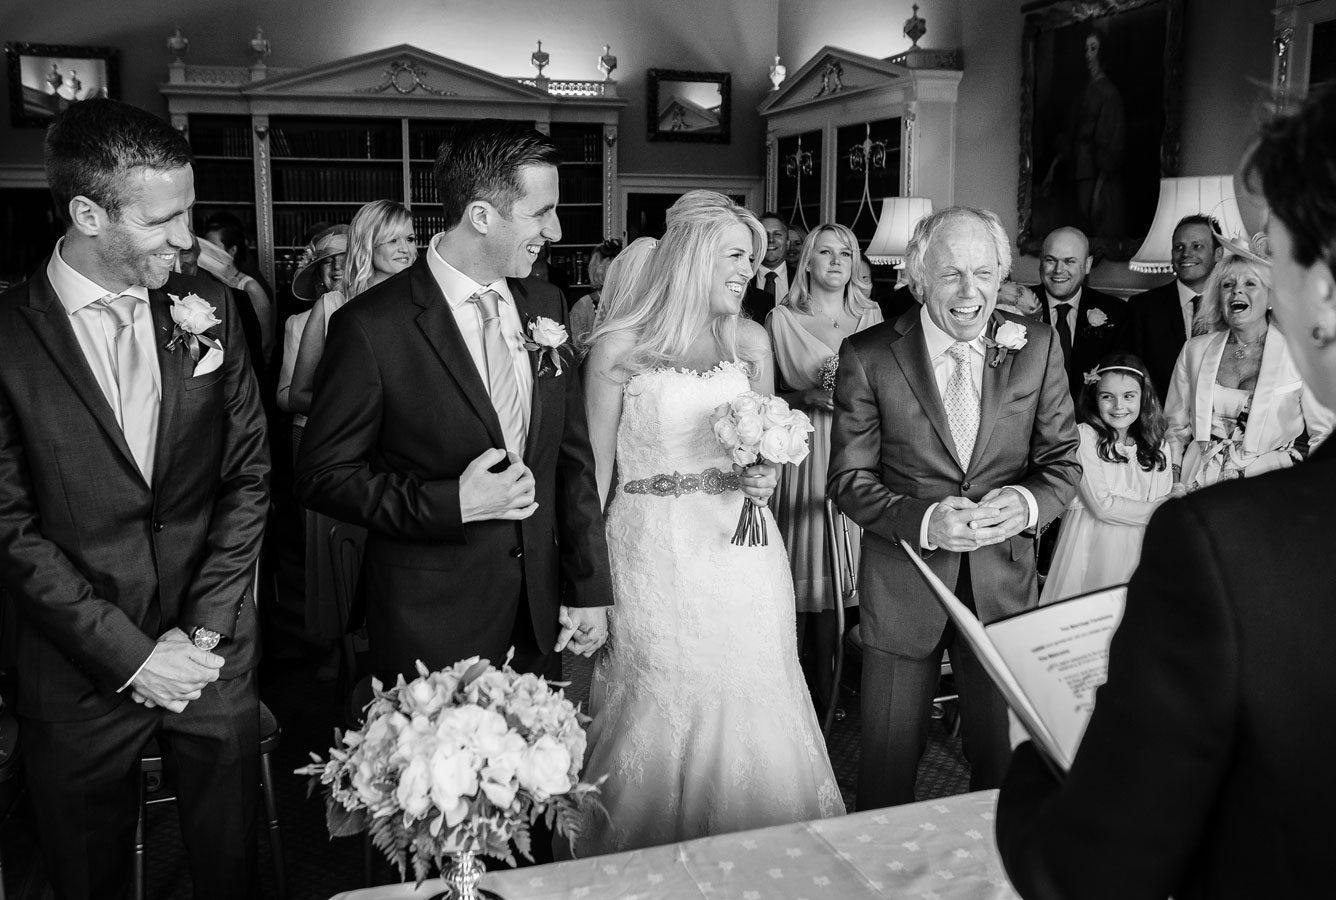 Brocket Hall Wedding ceremony image